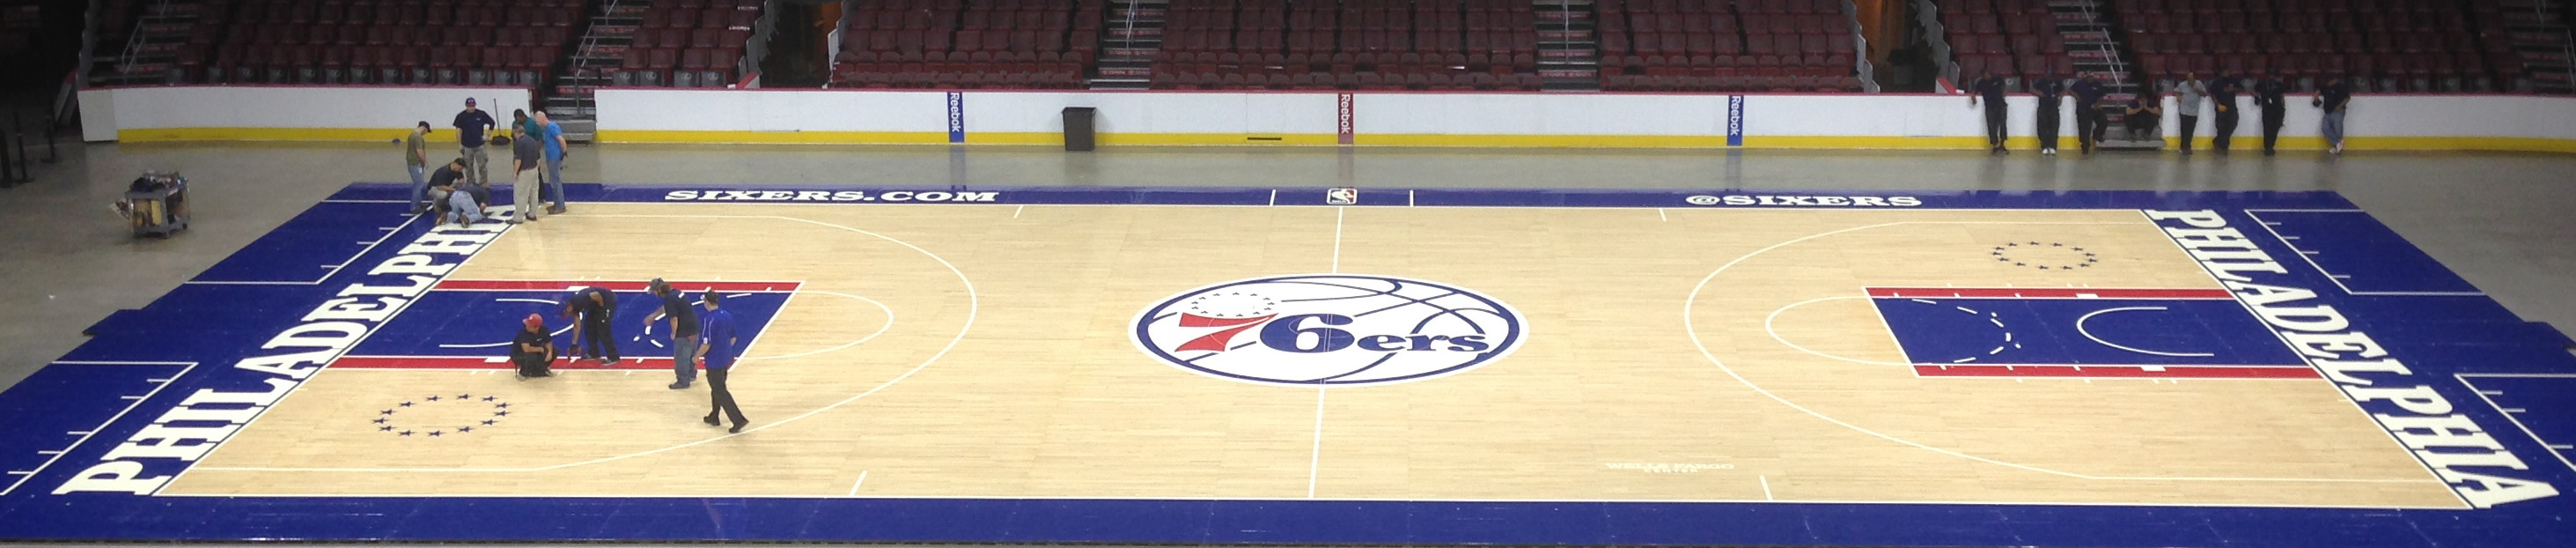 76ers-2015-16-court.jpg